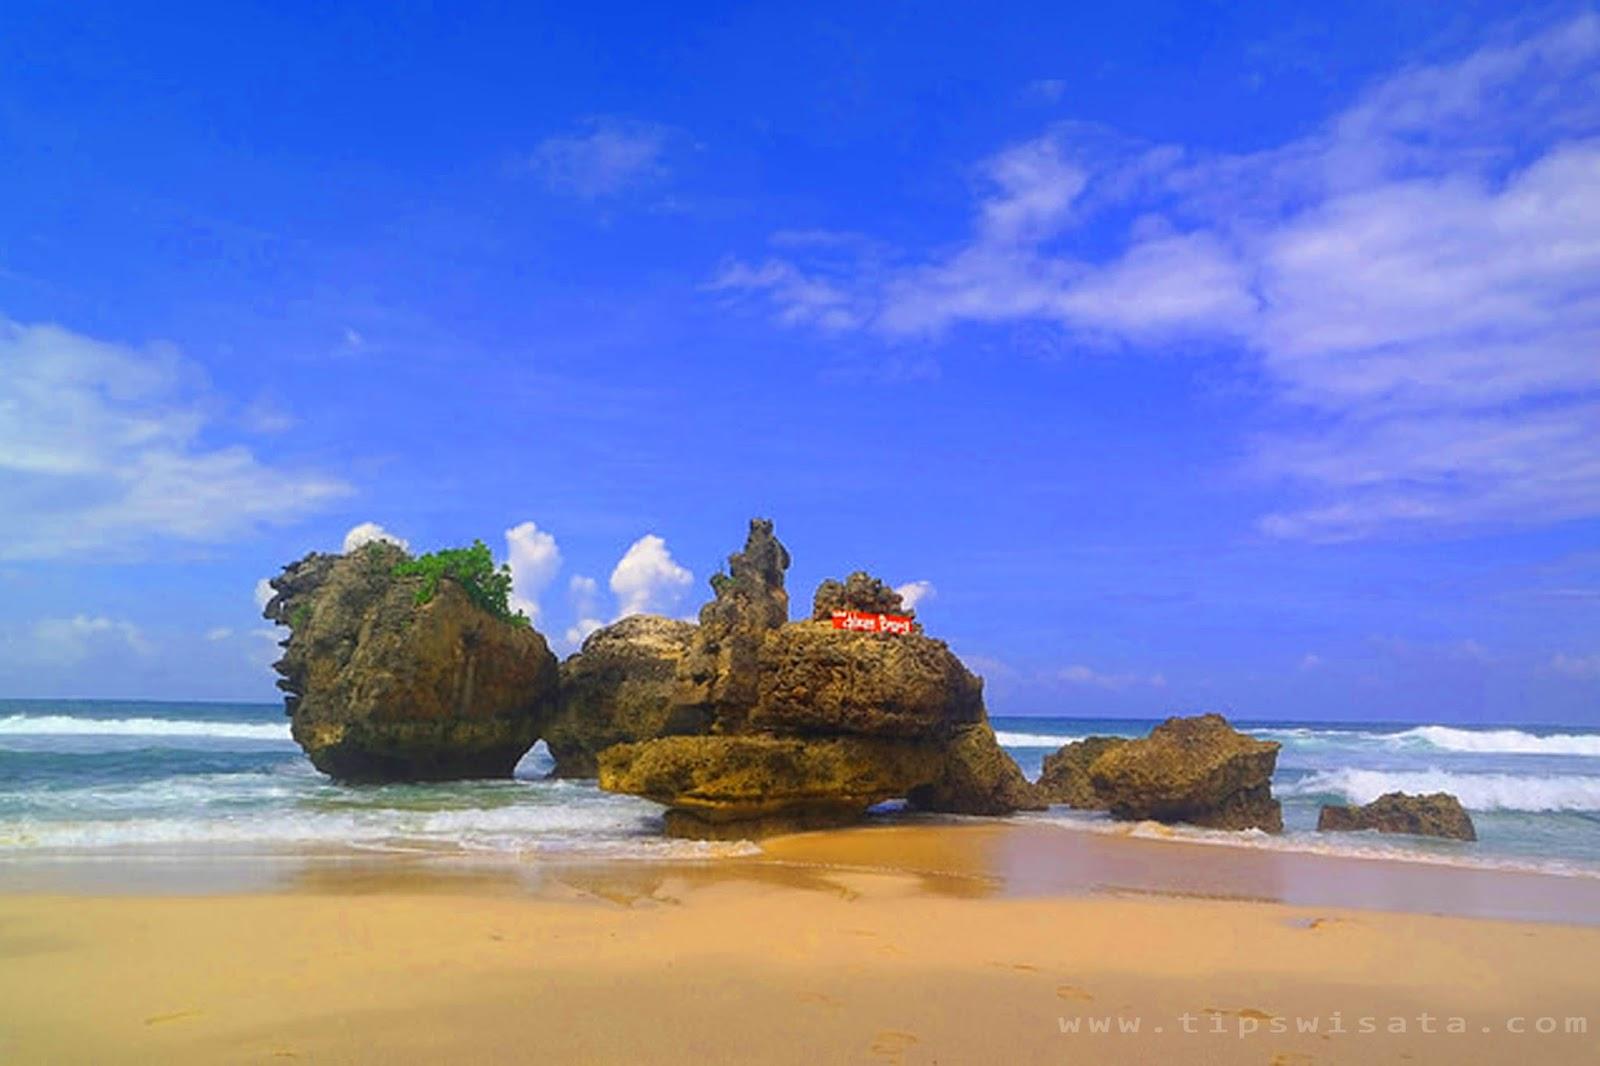 Wisata Pantai Banyu Meneng Selok Malang Kab